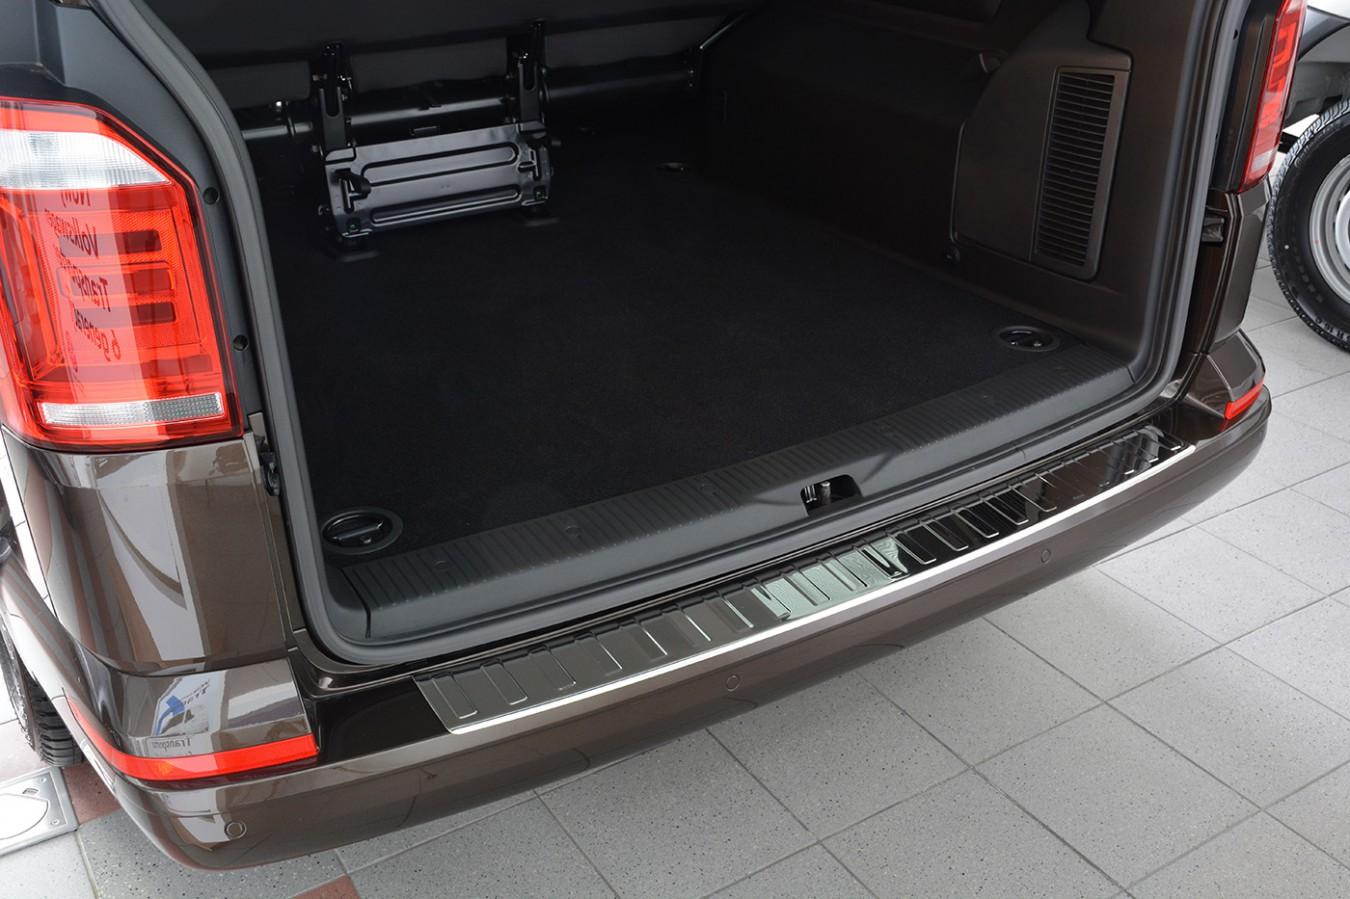 inox protezione paraurti per vw t6 multivan caravelle. Black Bedroom Furniture Sets. Home Design Ideas